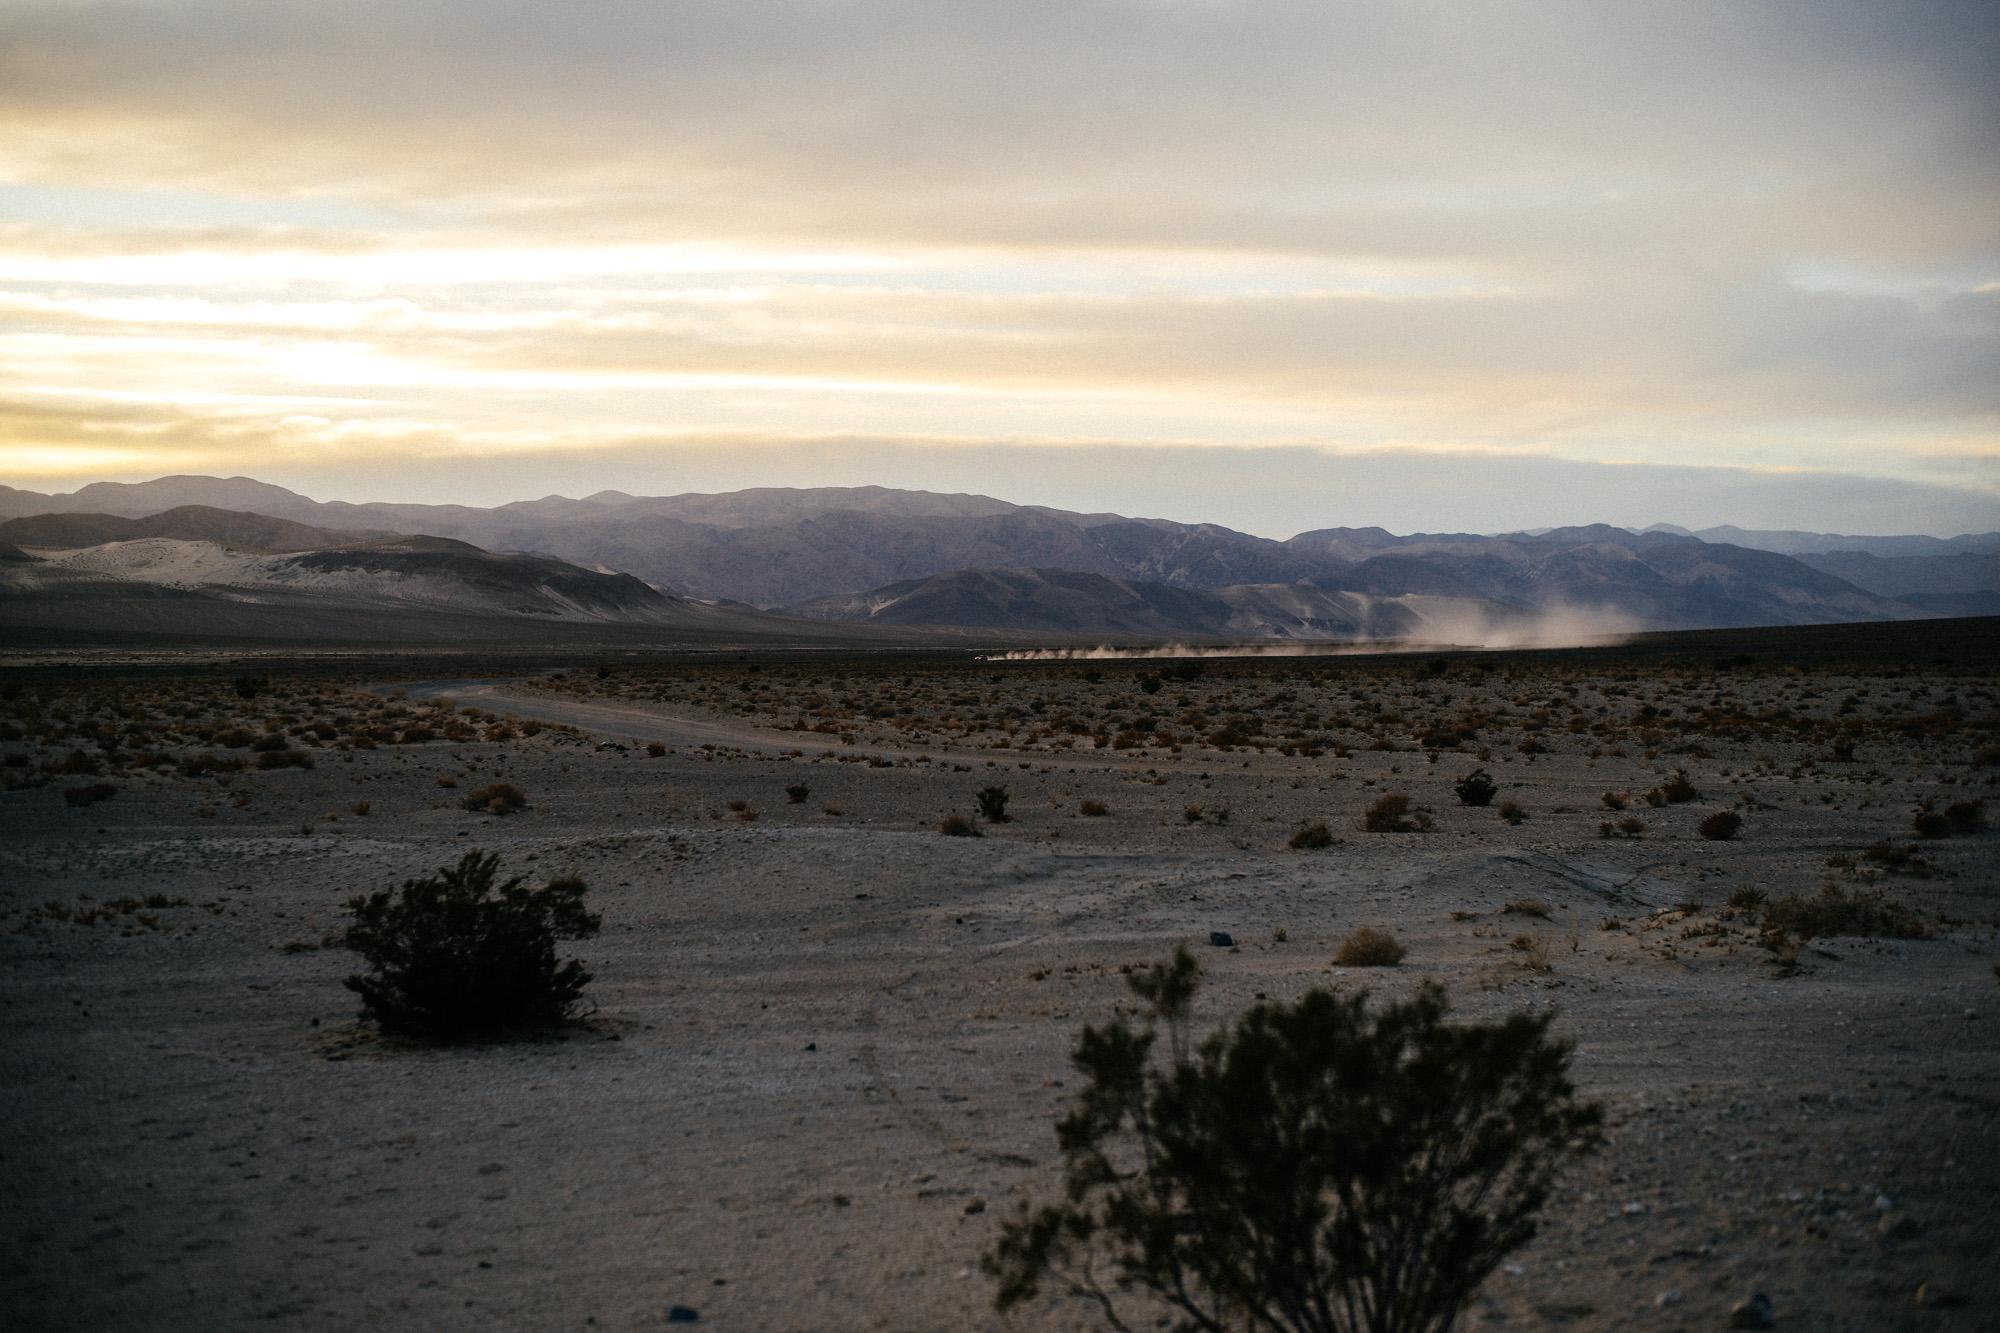 Dust stream